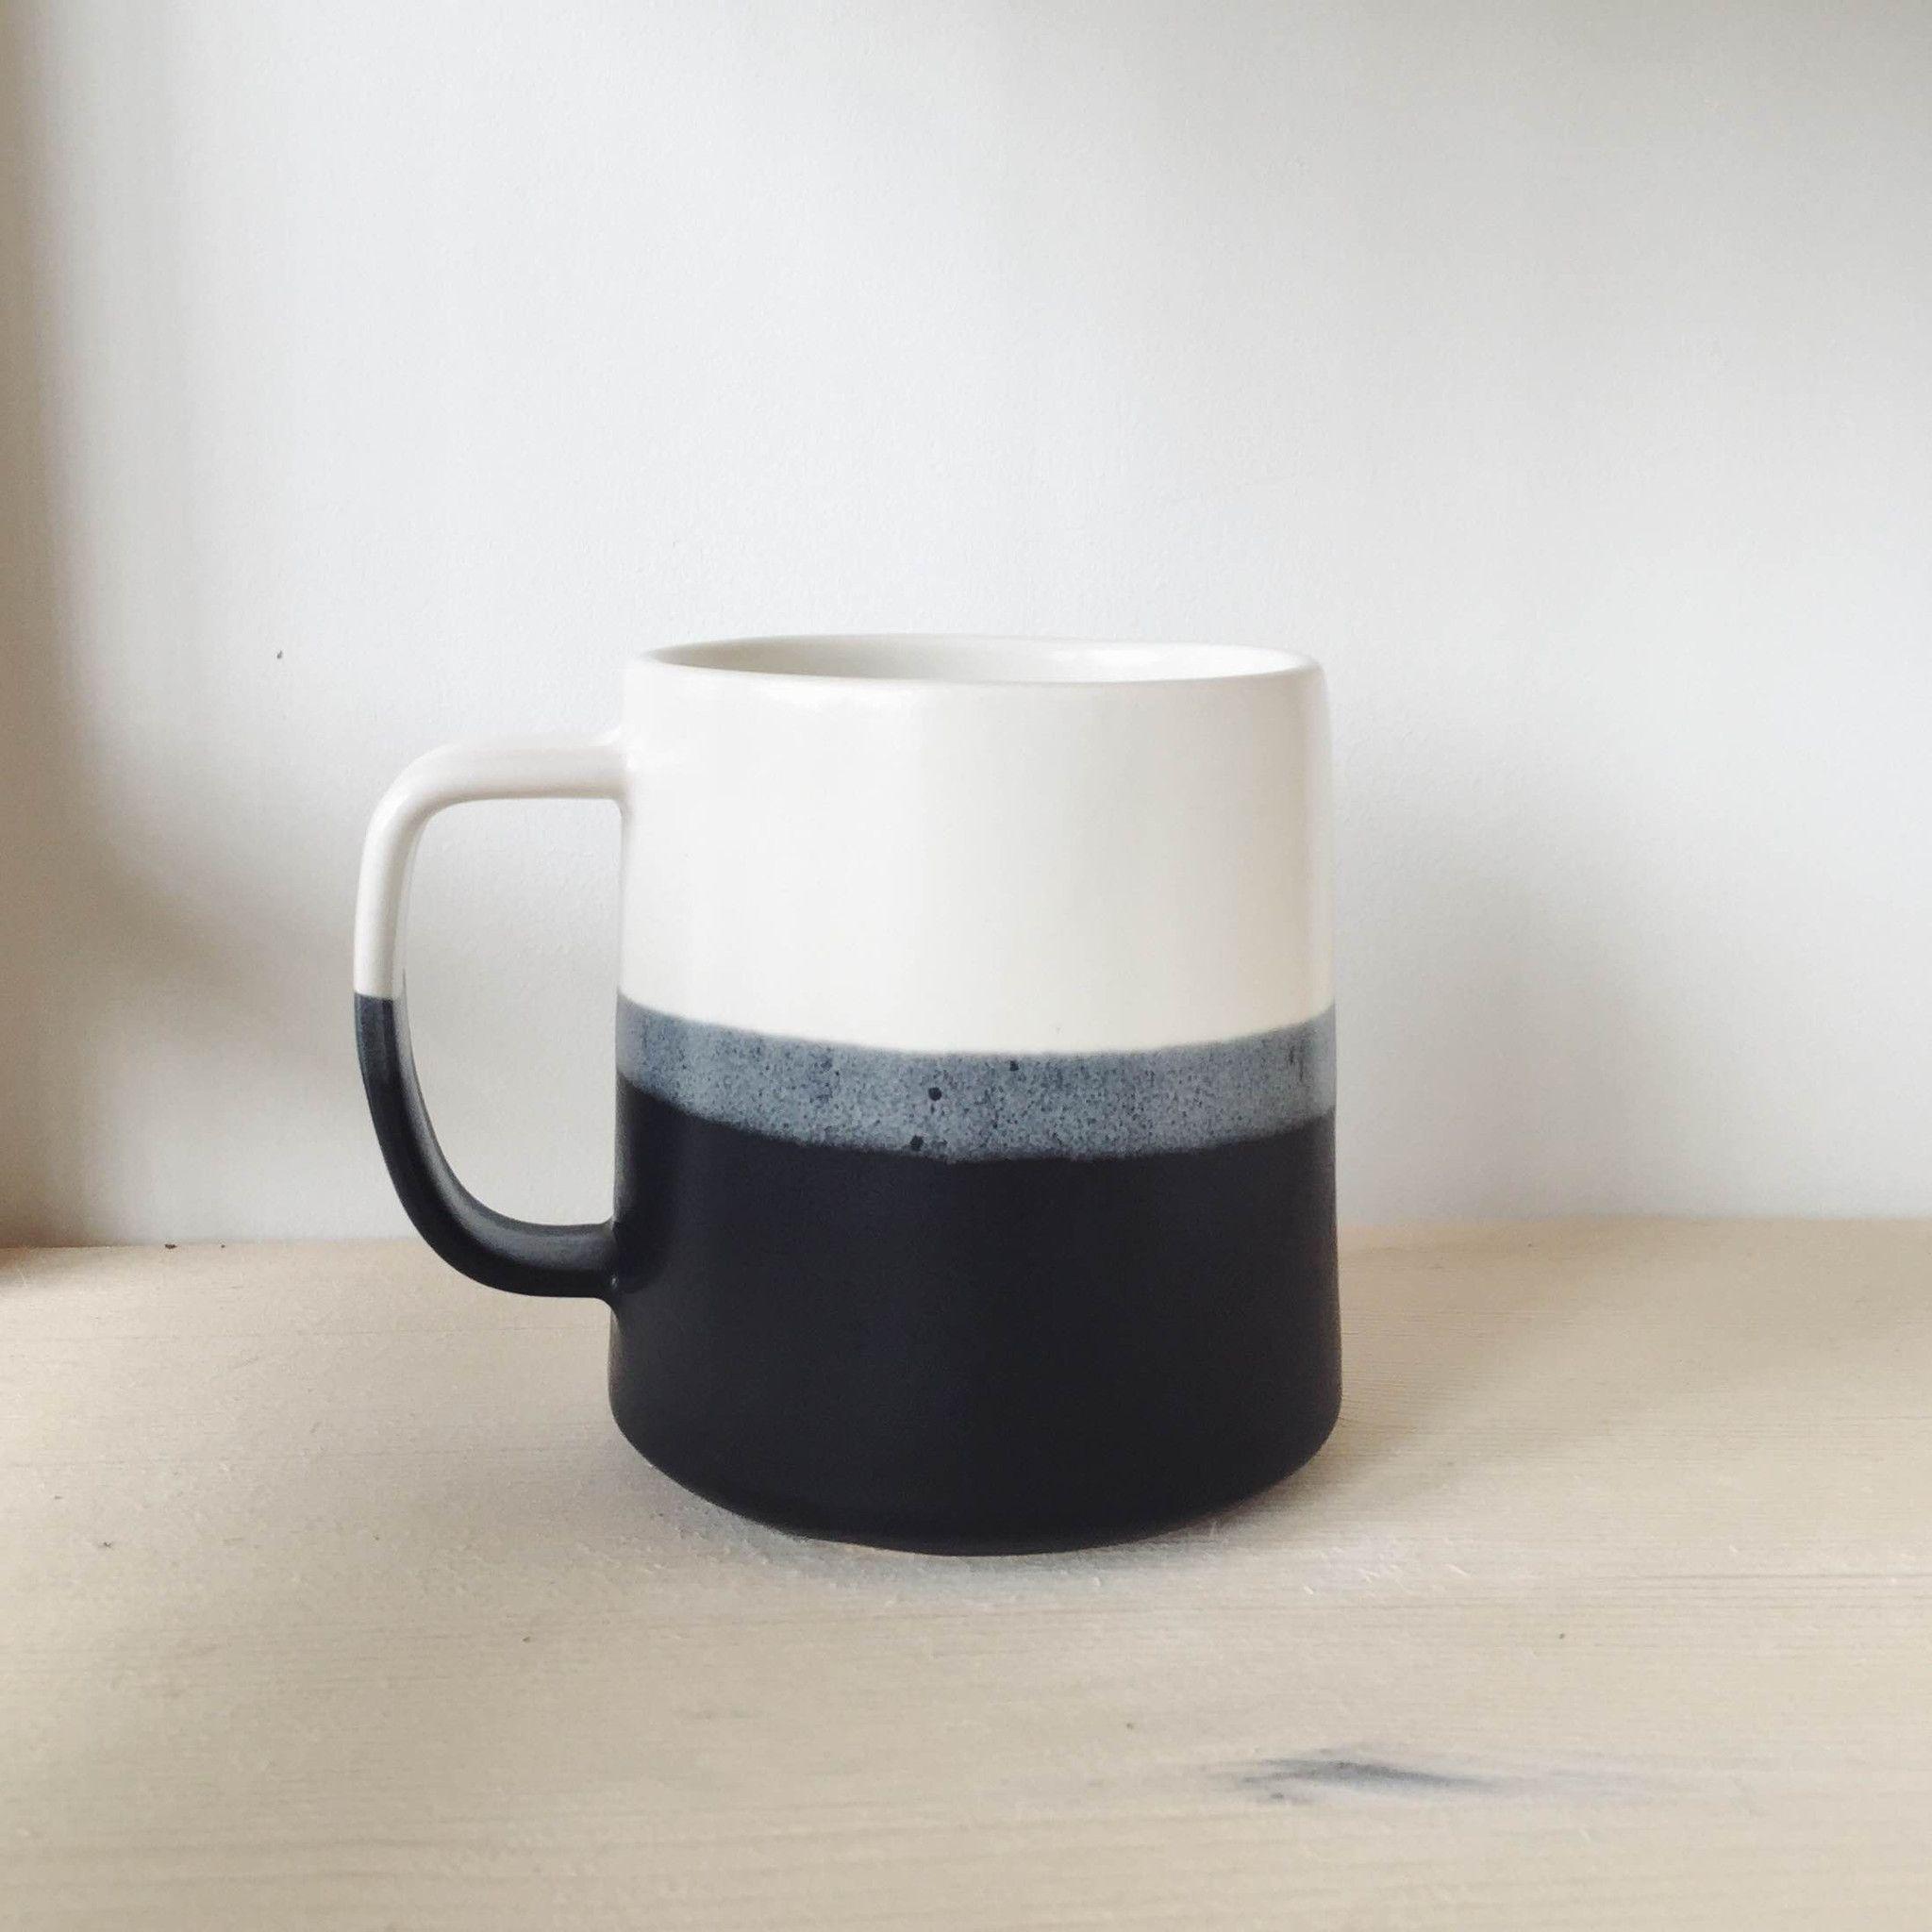 Danish Mug Black Keramiek Servies Creatief